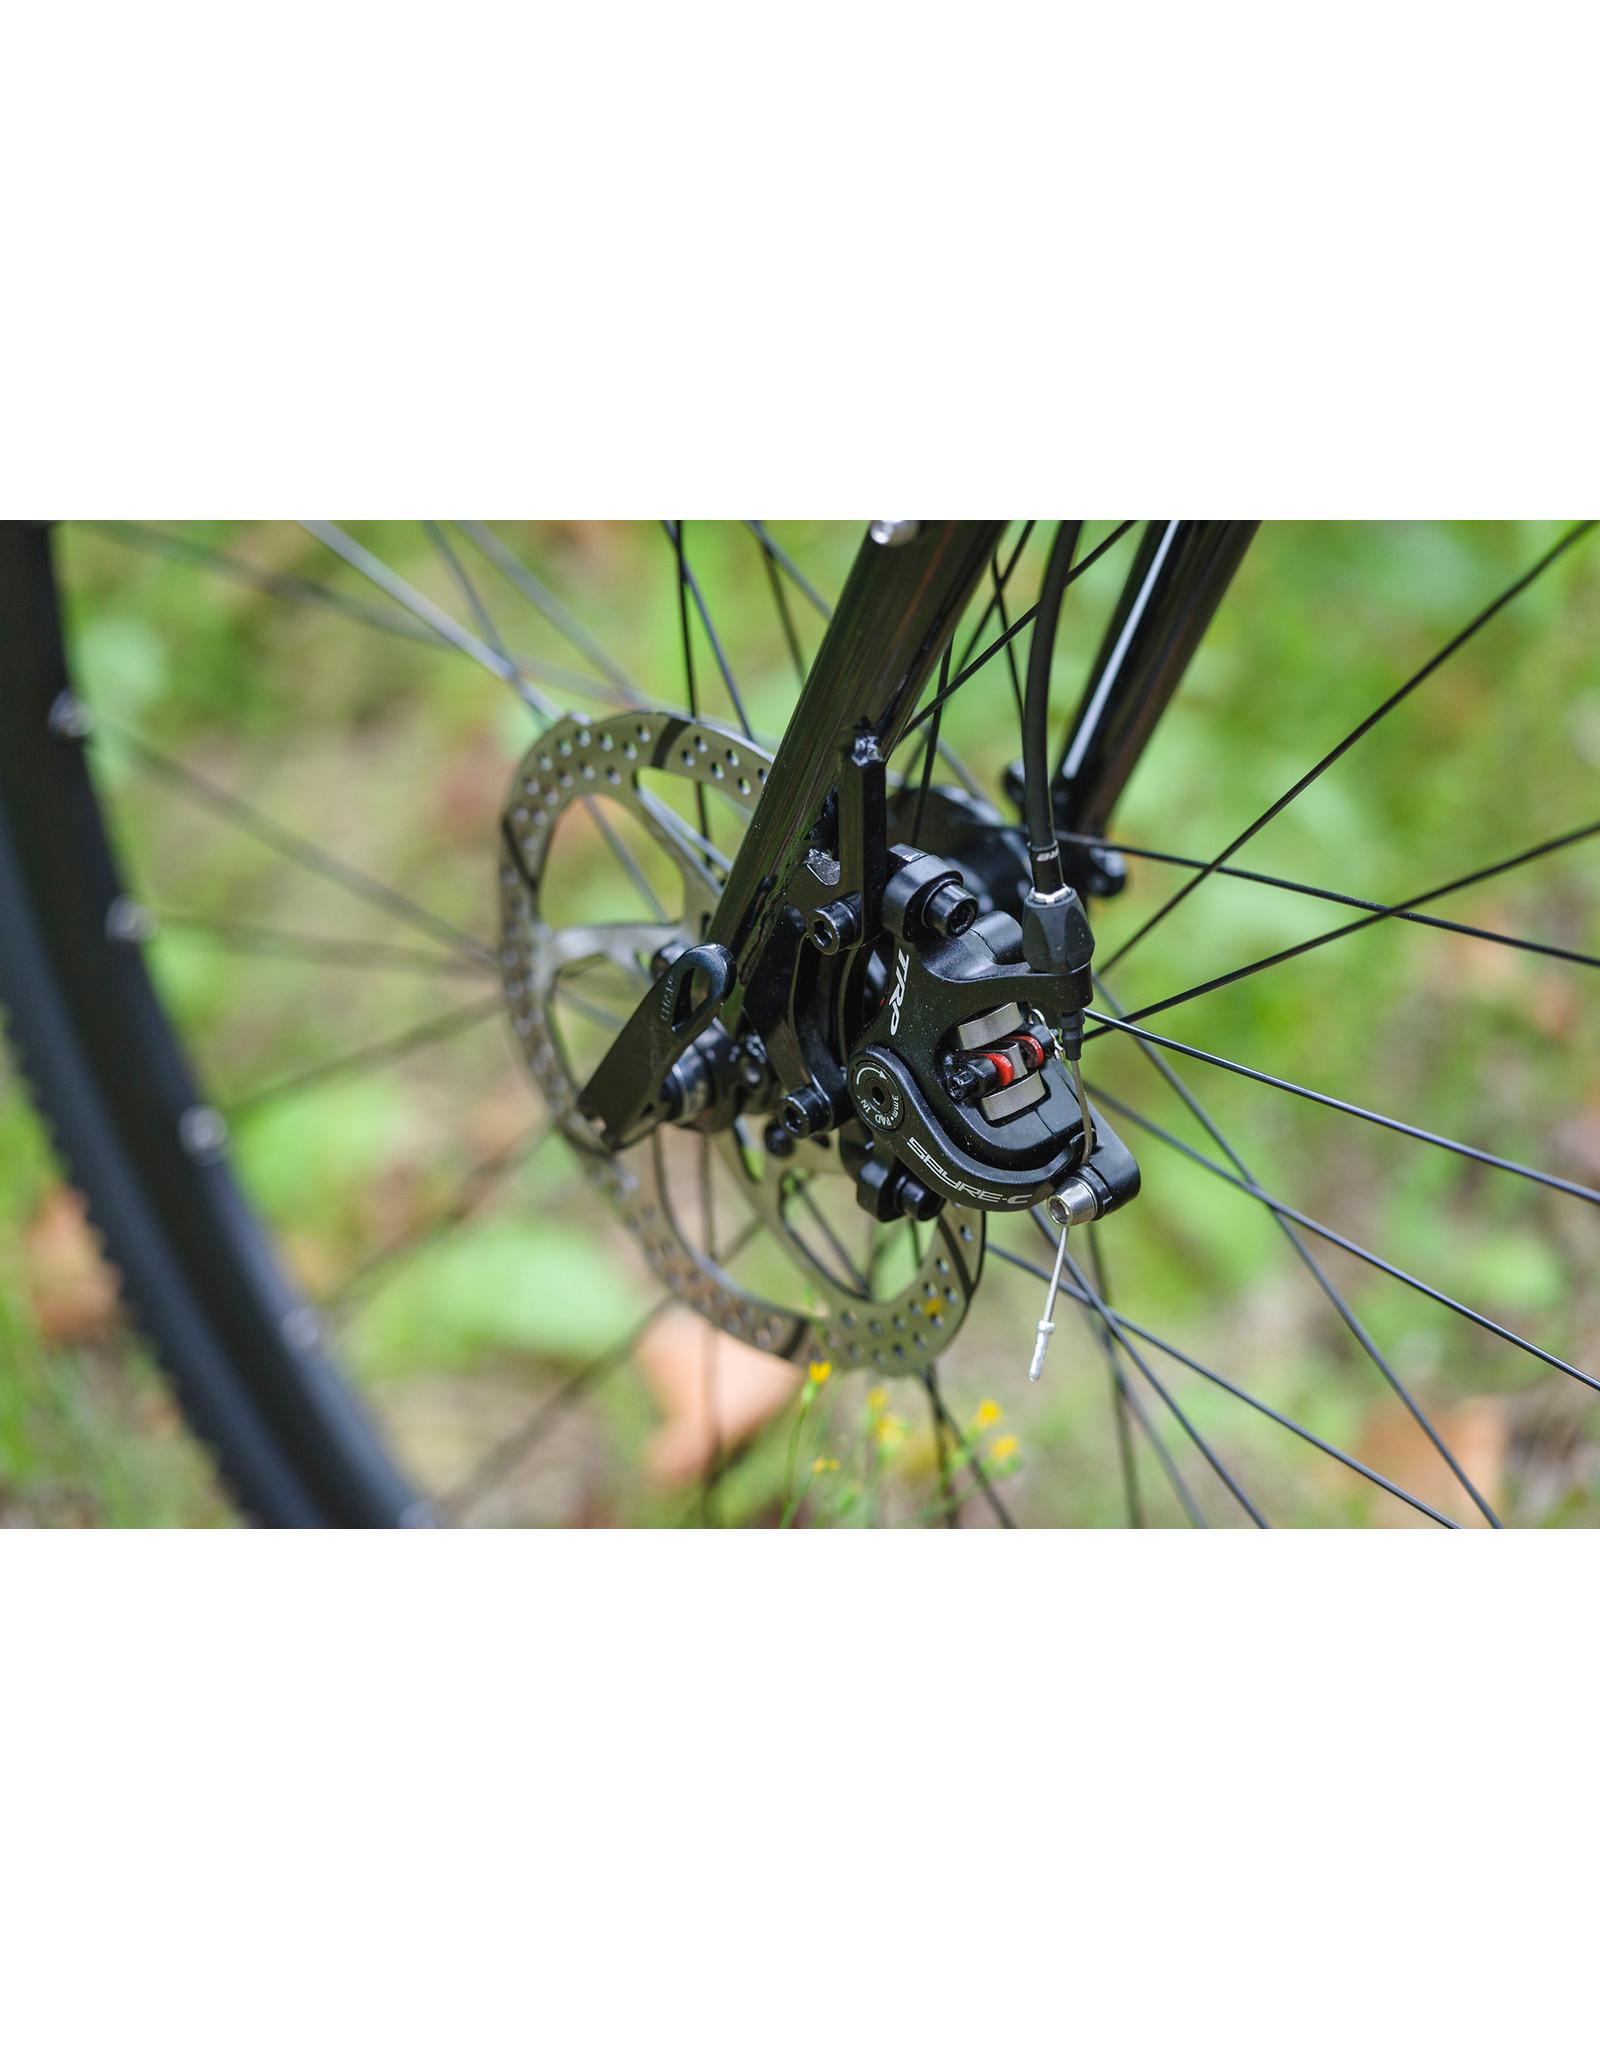 Genesis Croix De Fer 10 Adventure Bike 2020